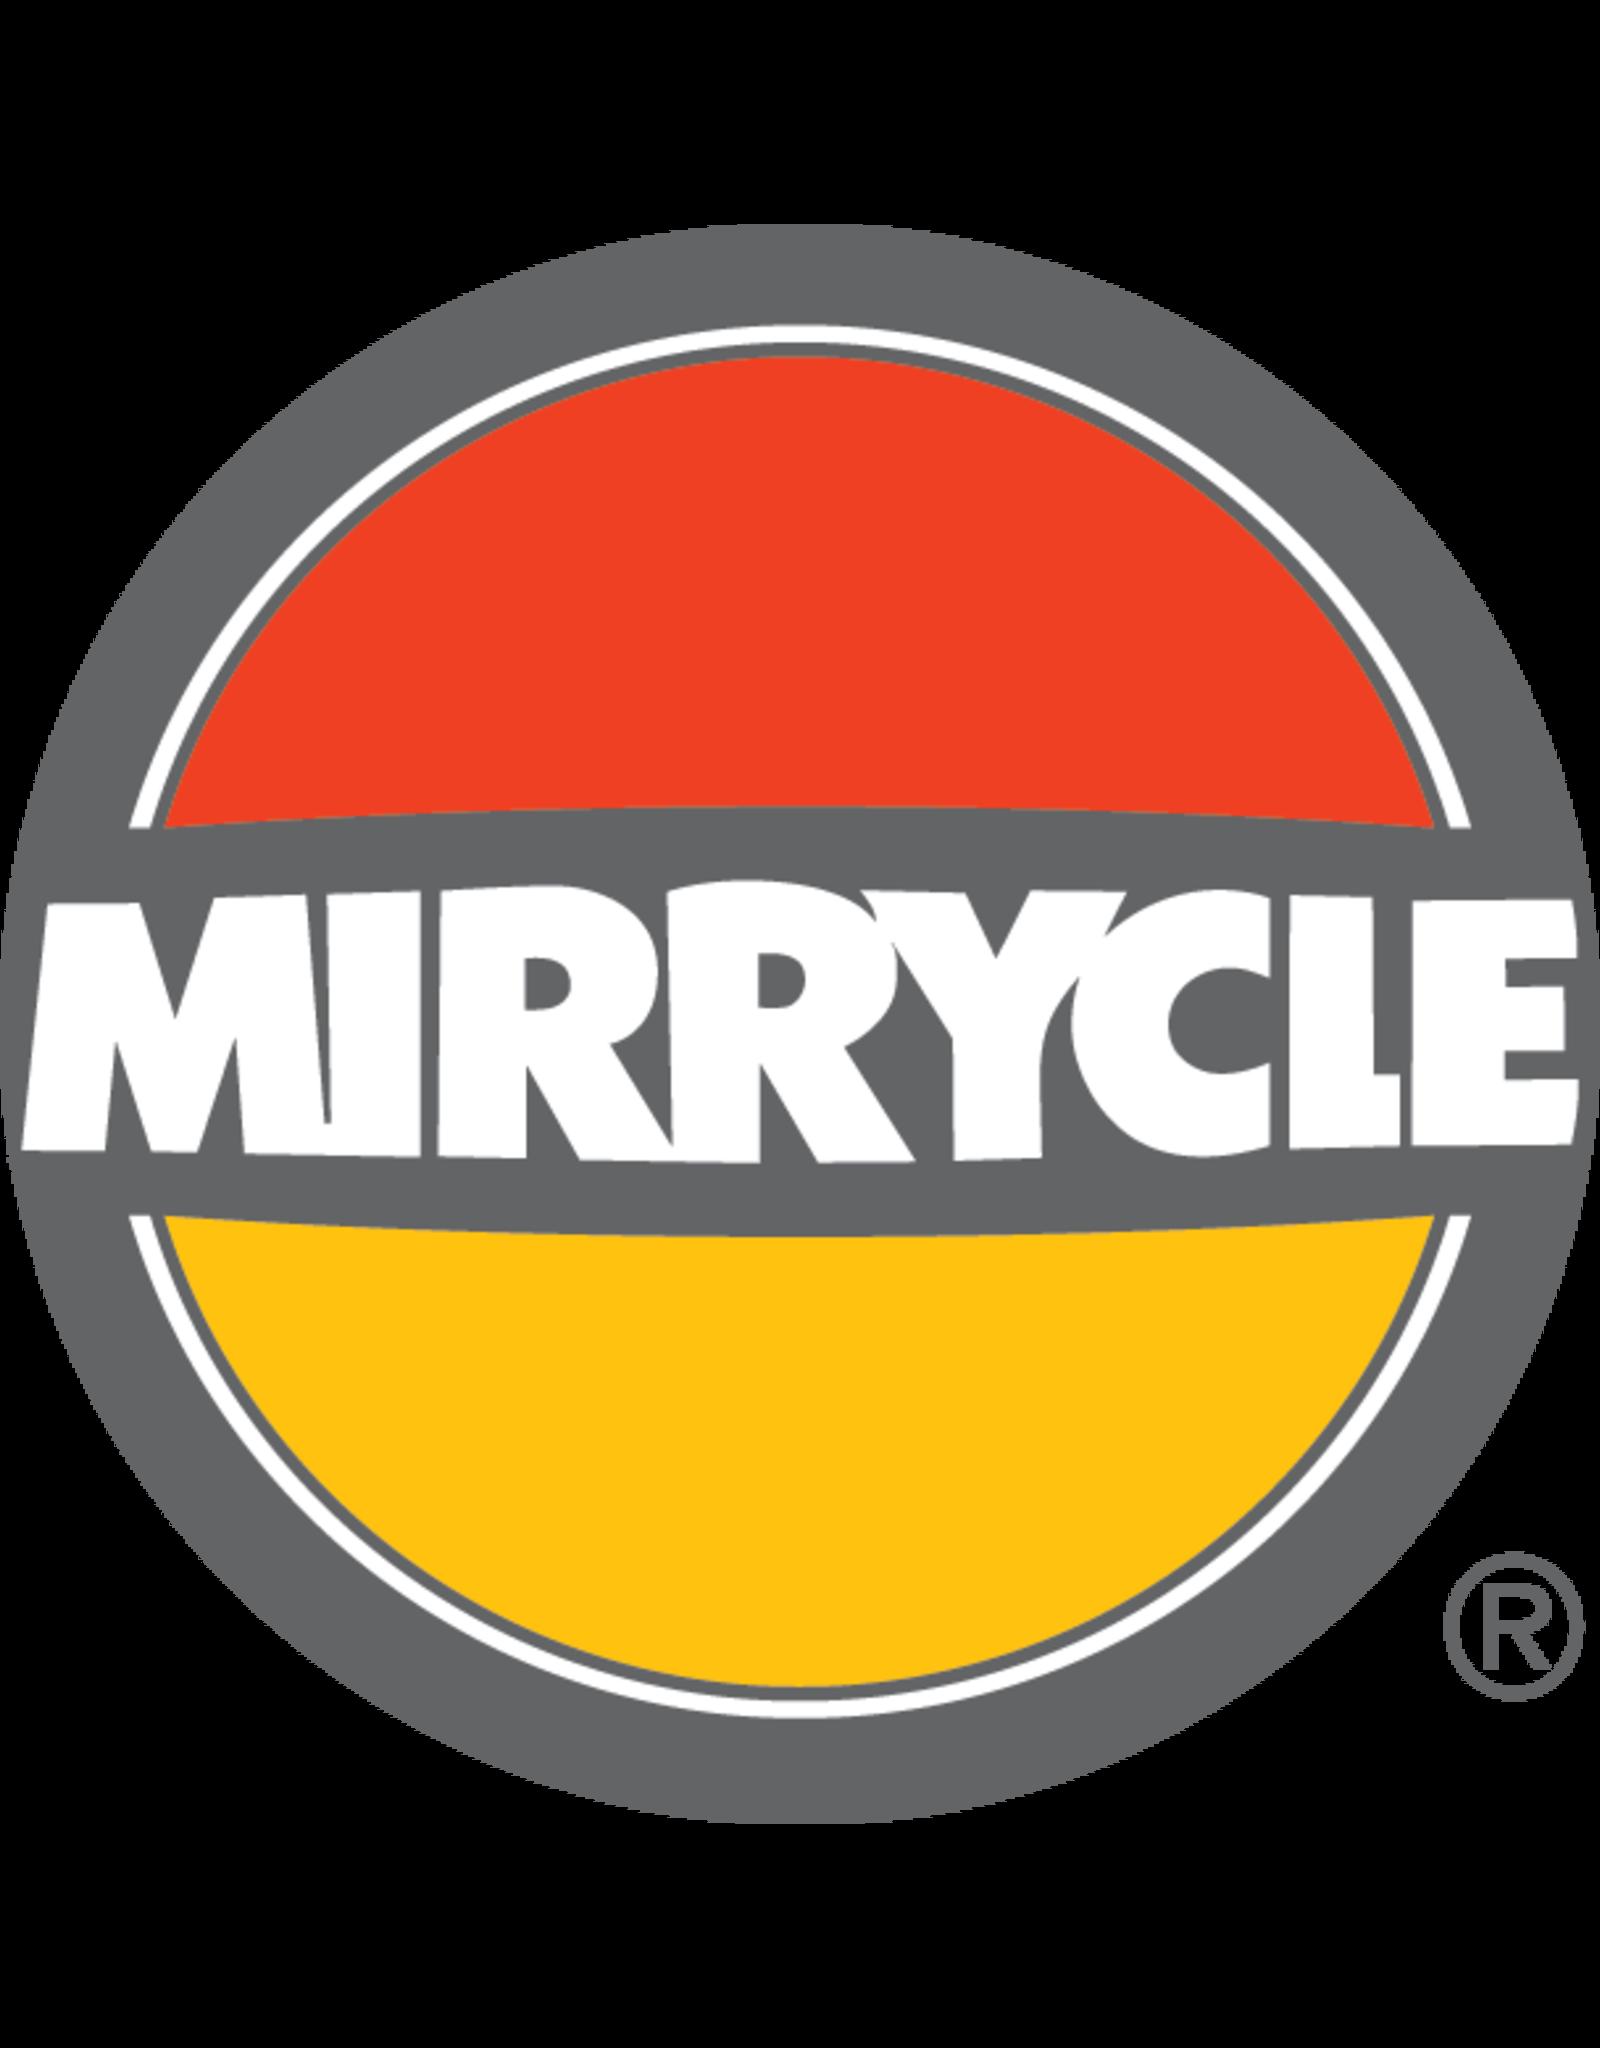 MIRRYCLE Mirrorcycle MTB Bar End Mountain Bicycle Mirror